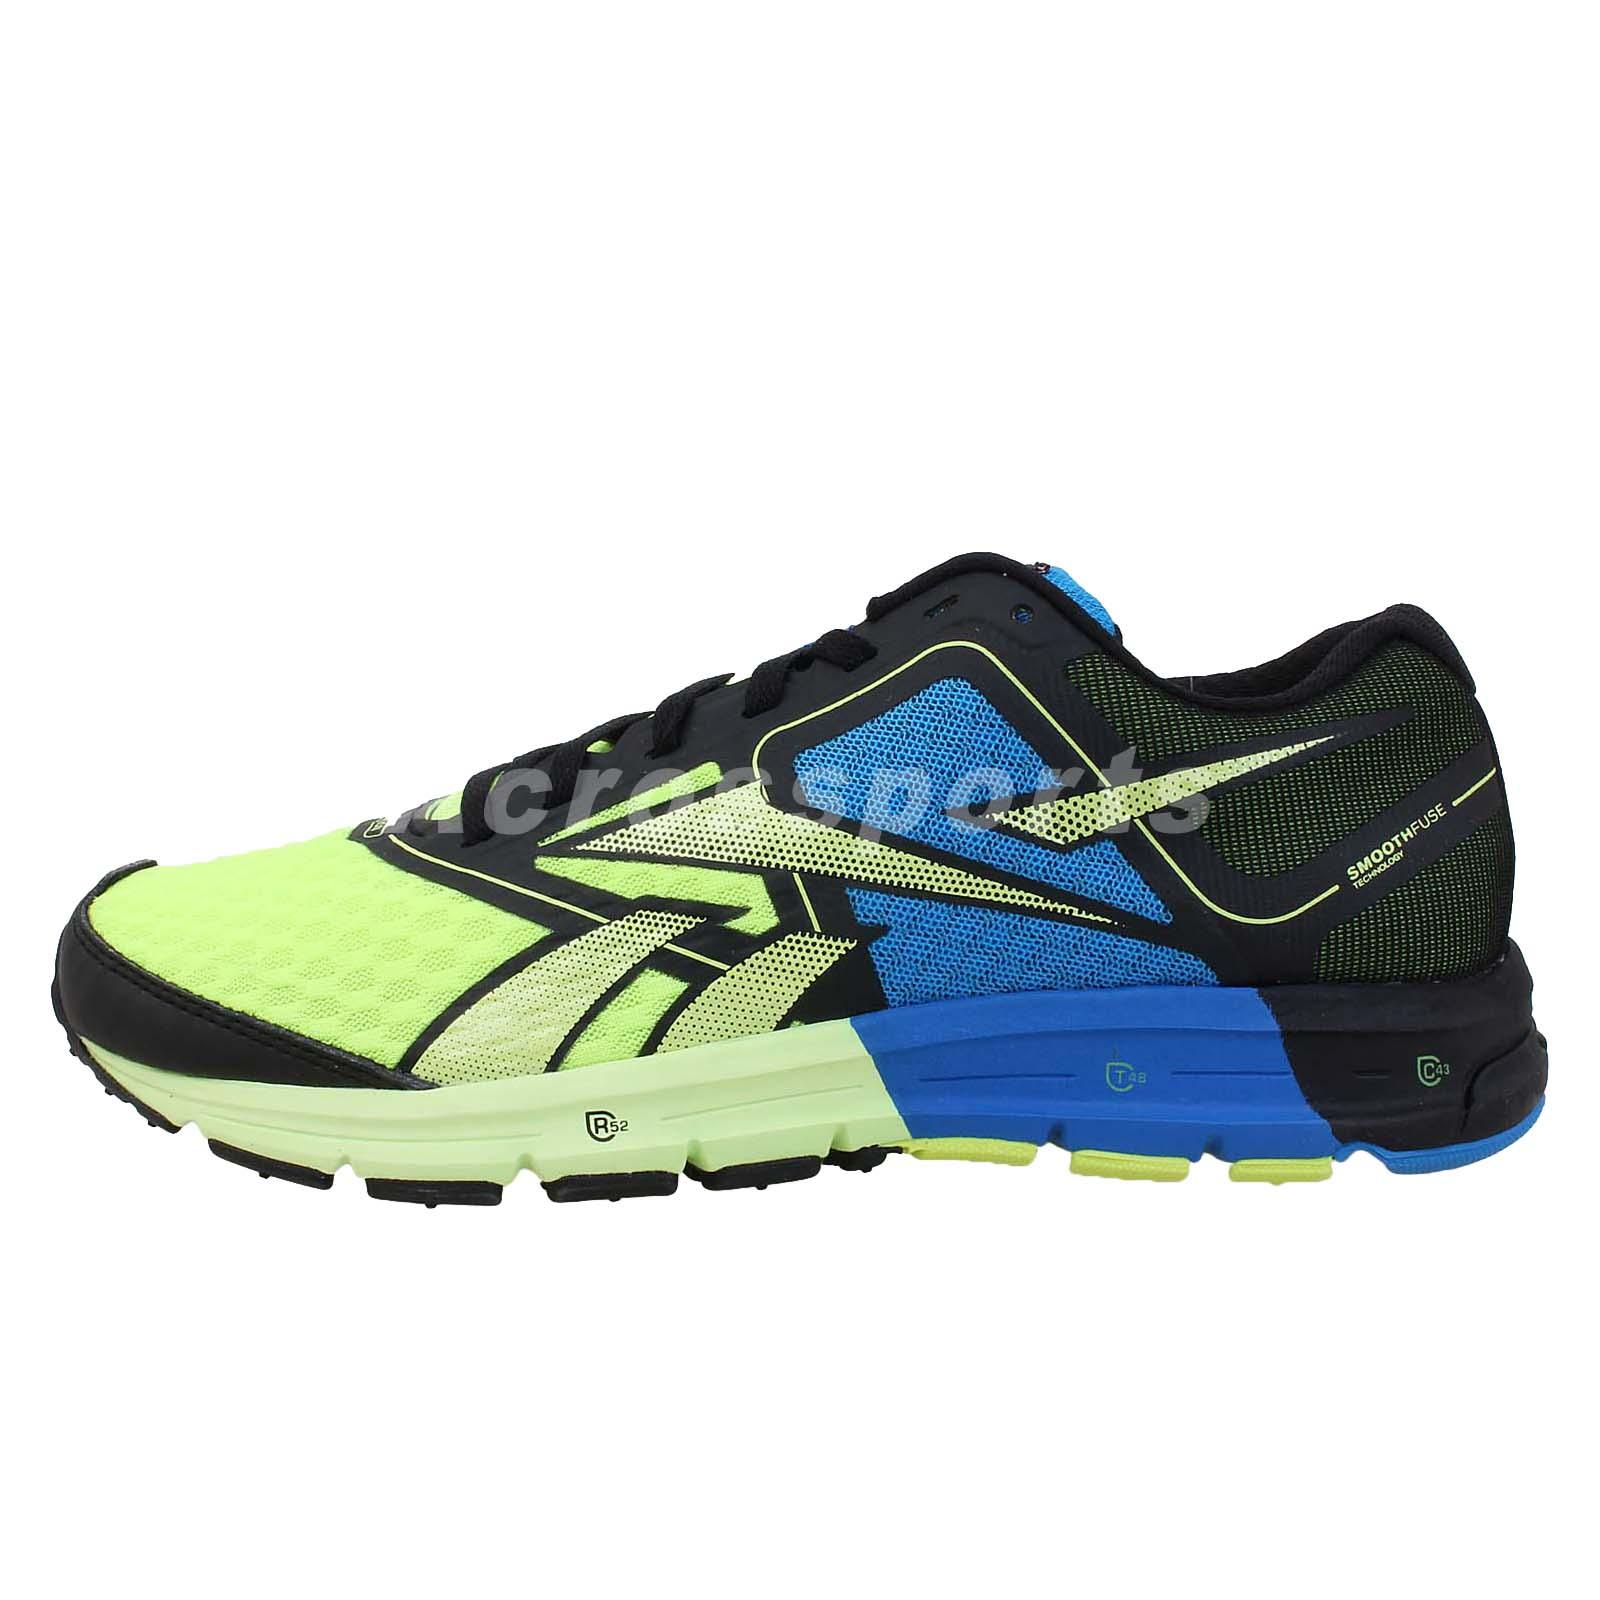 Reebok Running Shoes 2013 Reebok One Cushion 201...